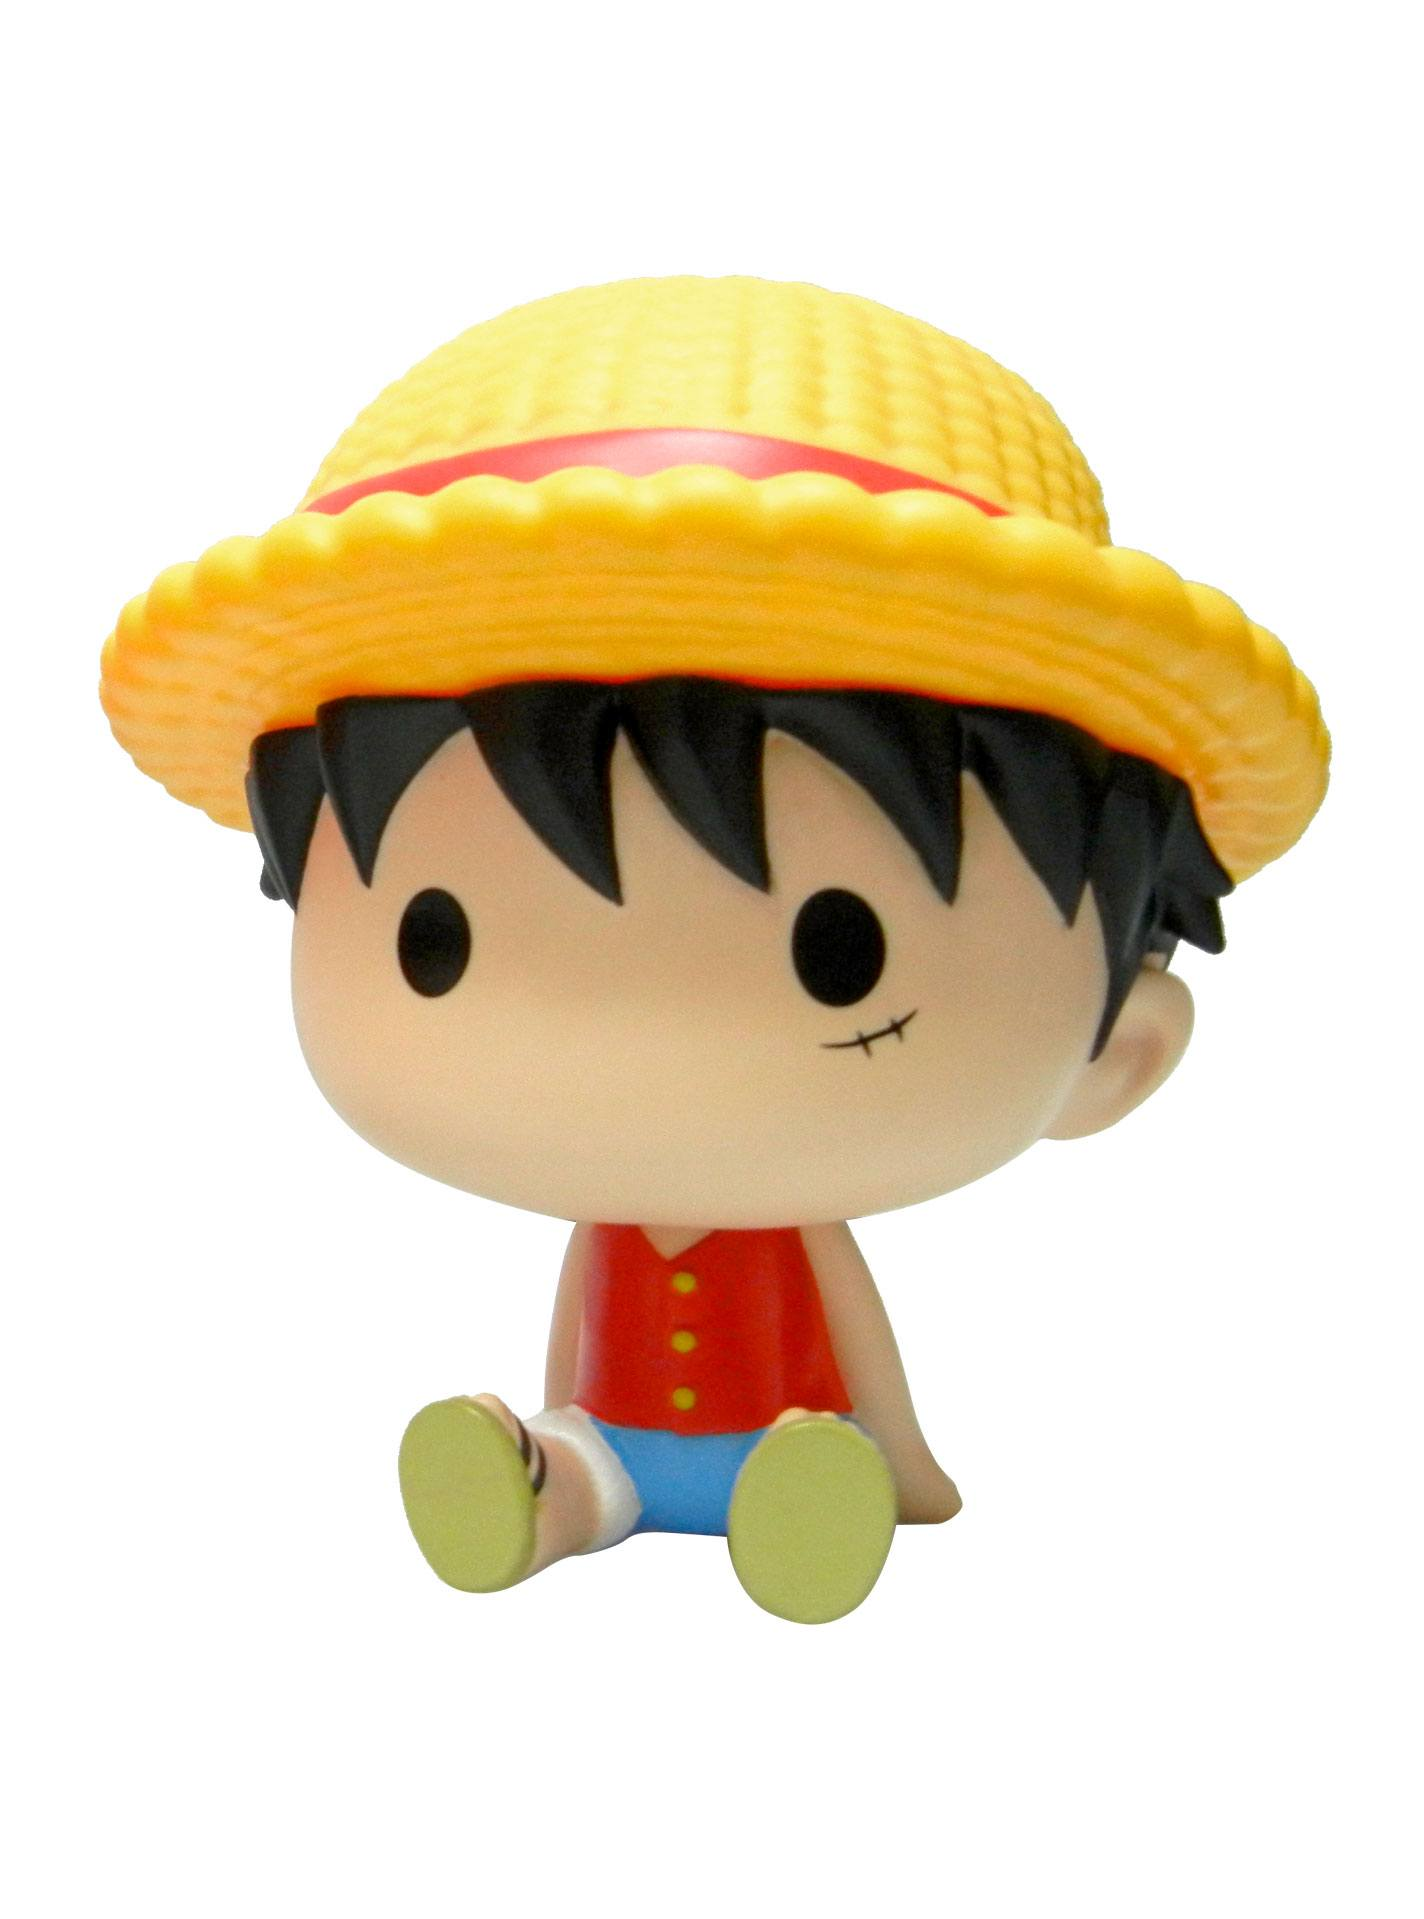 One Piece Chibi Bust Bank Luffy 15 cm